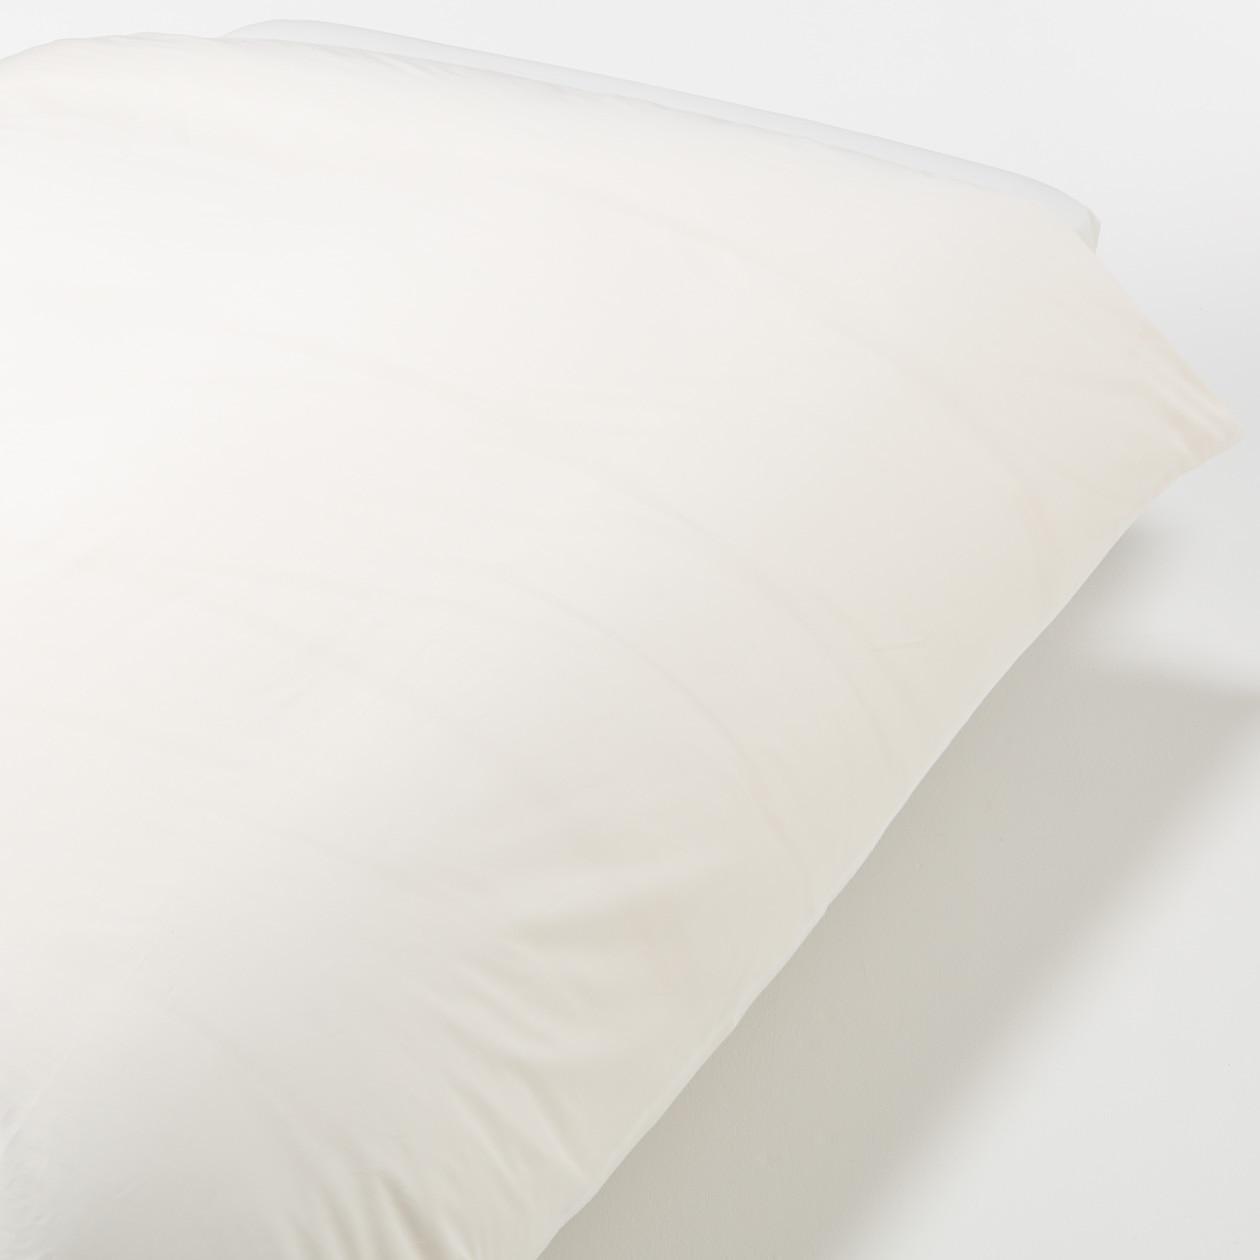 Ind Ct H Density Satin Hotel Use Duvet Cover S O Wht 150